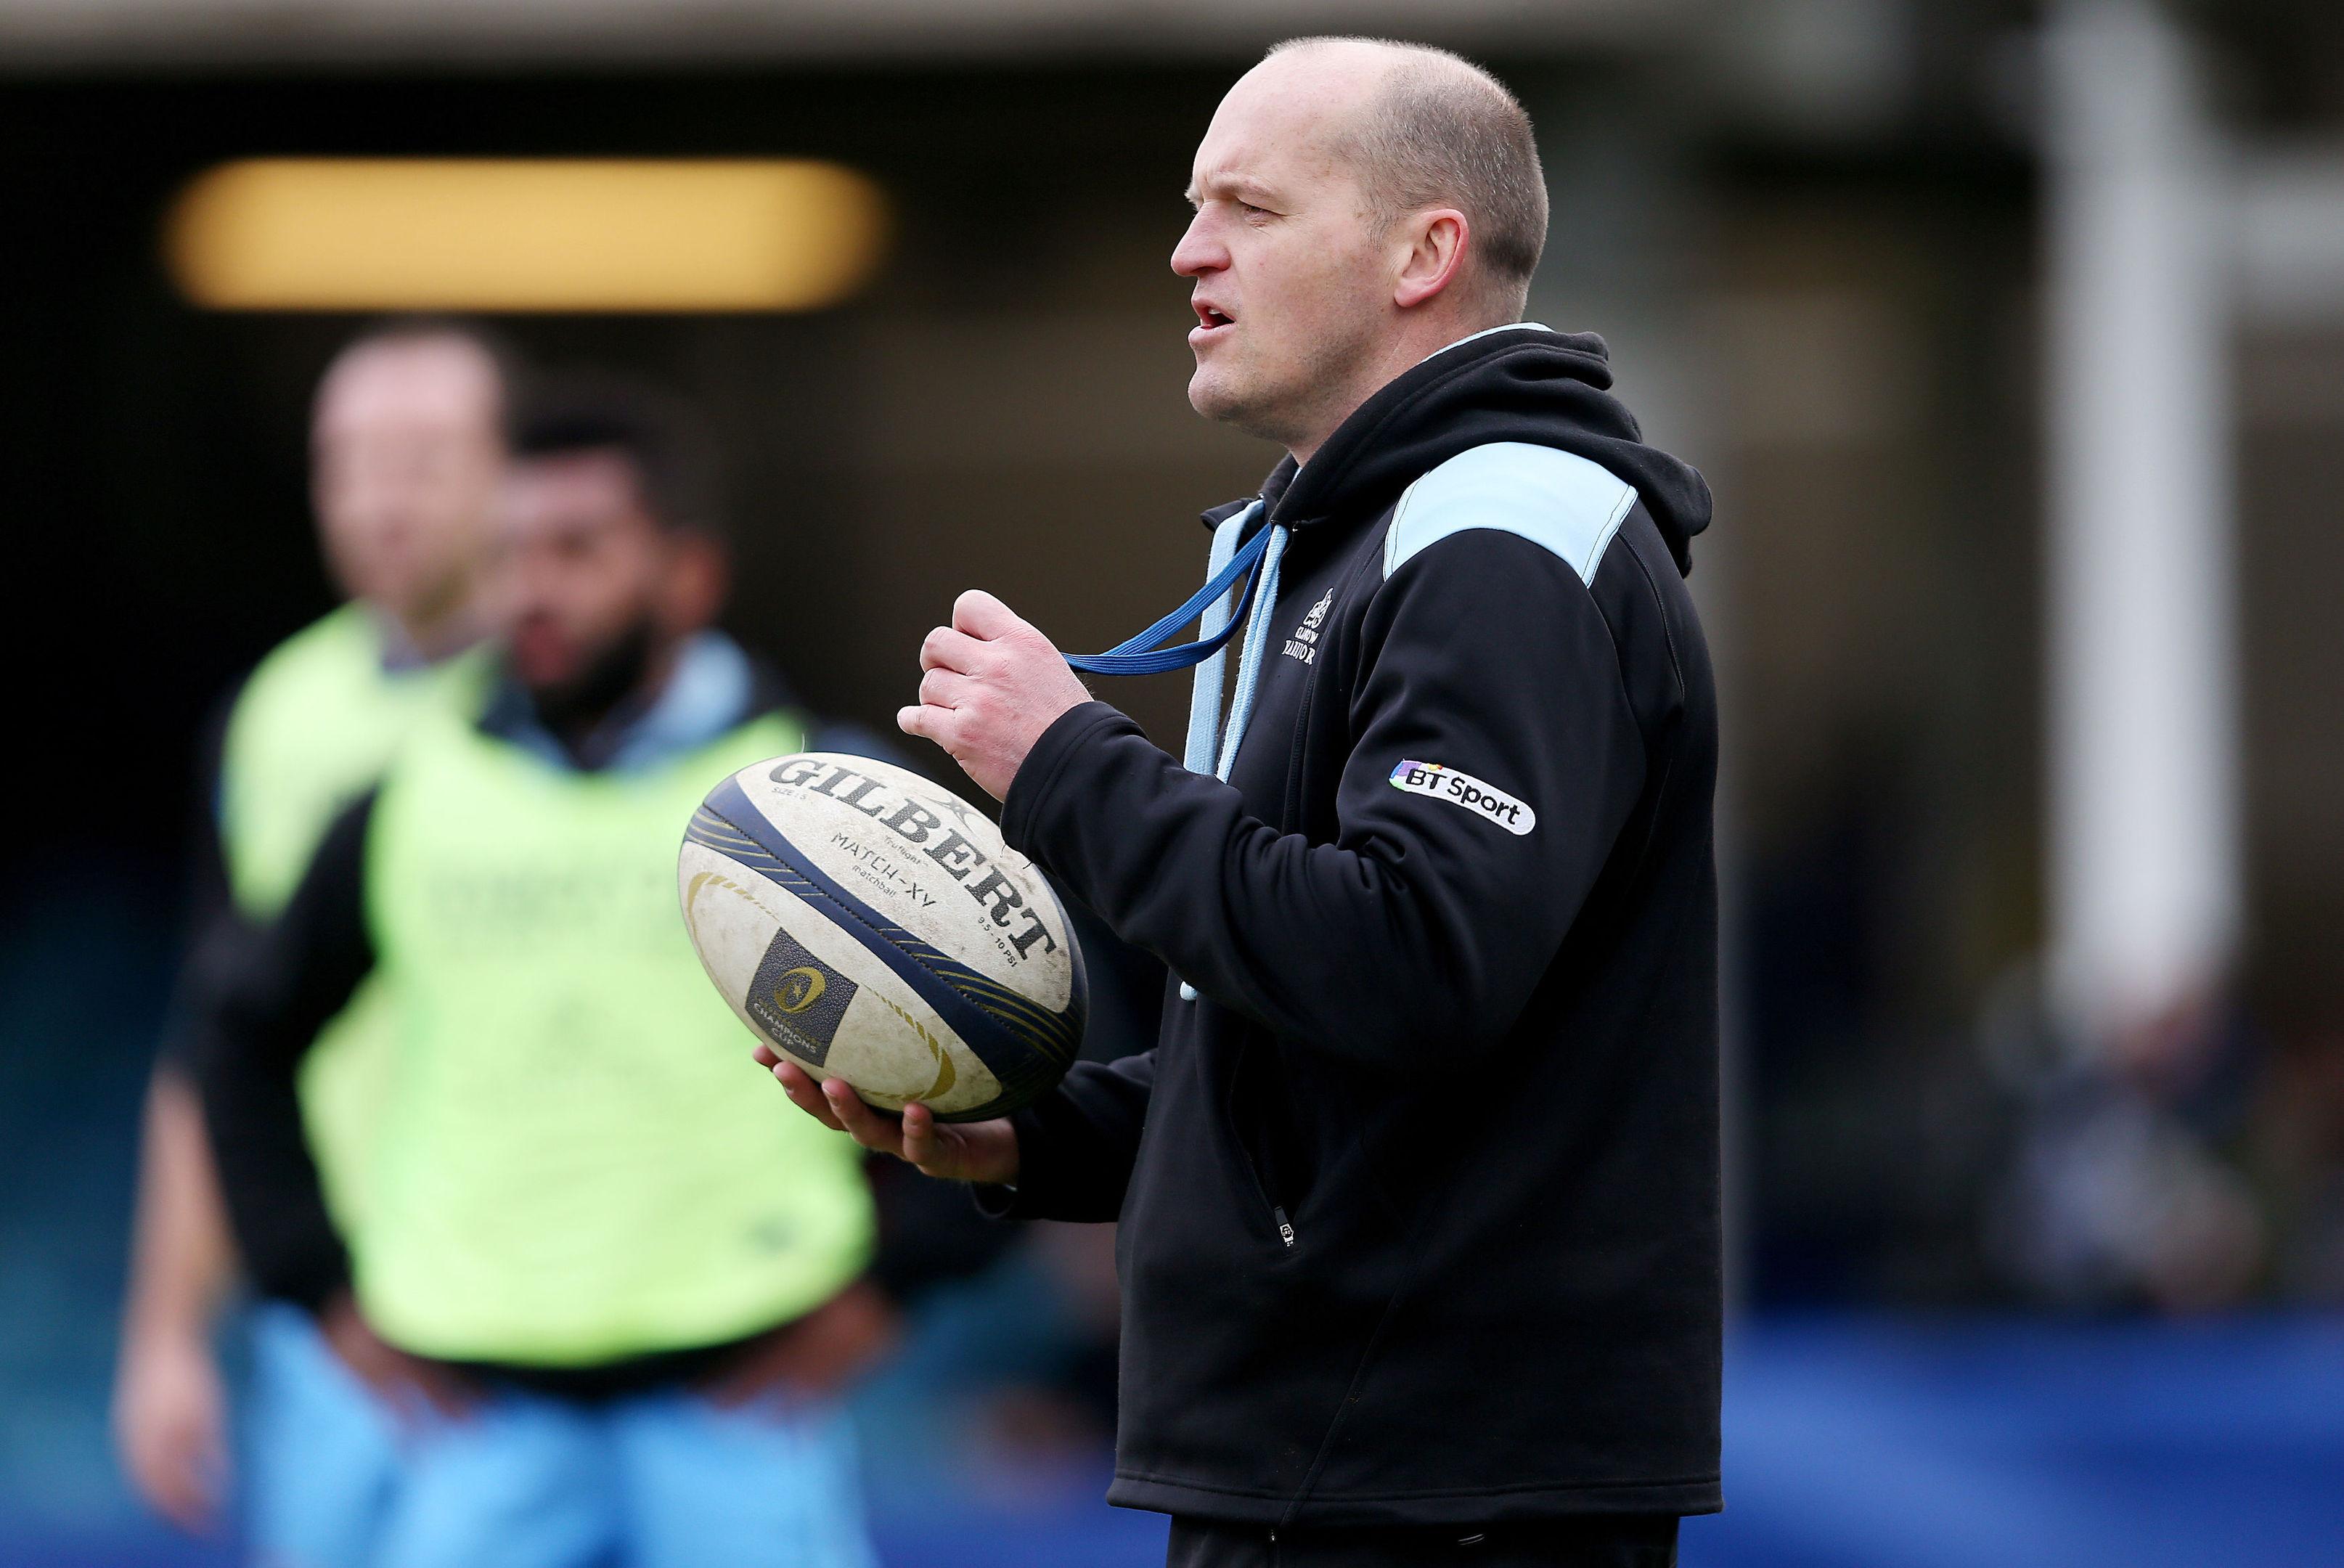 Gregor Townsend has long been earmarked as a future Scotland head coach.